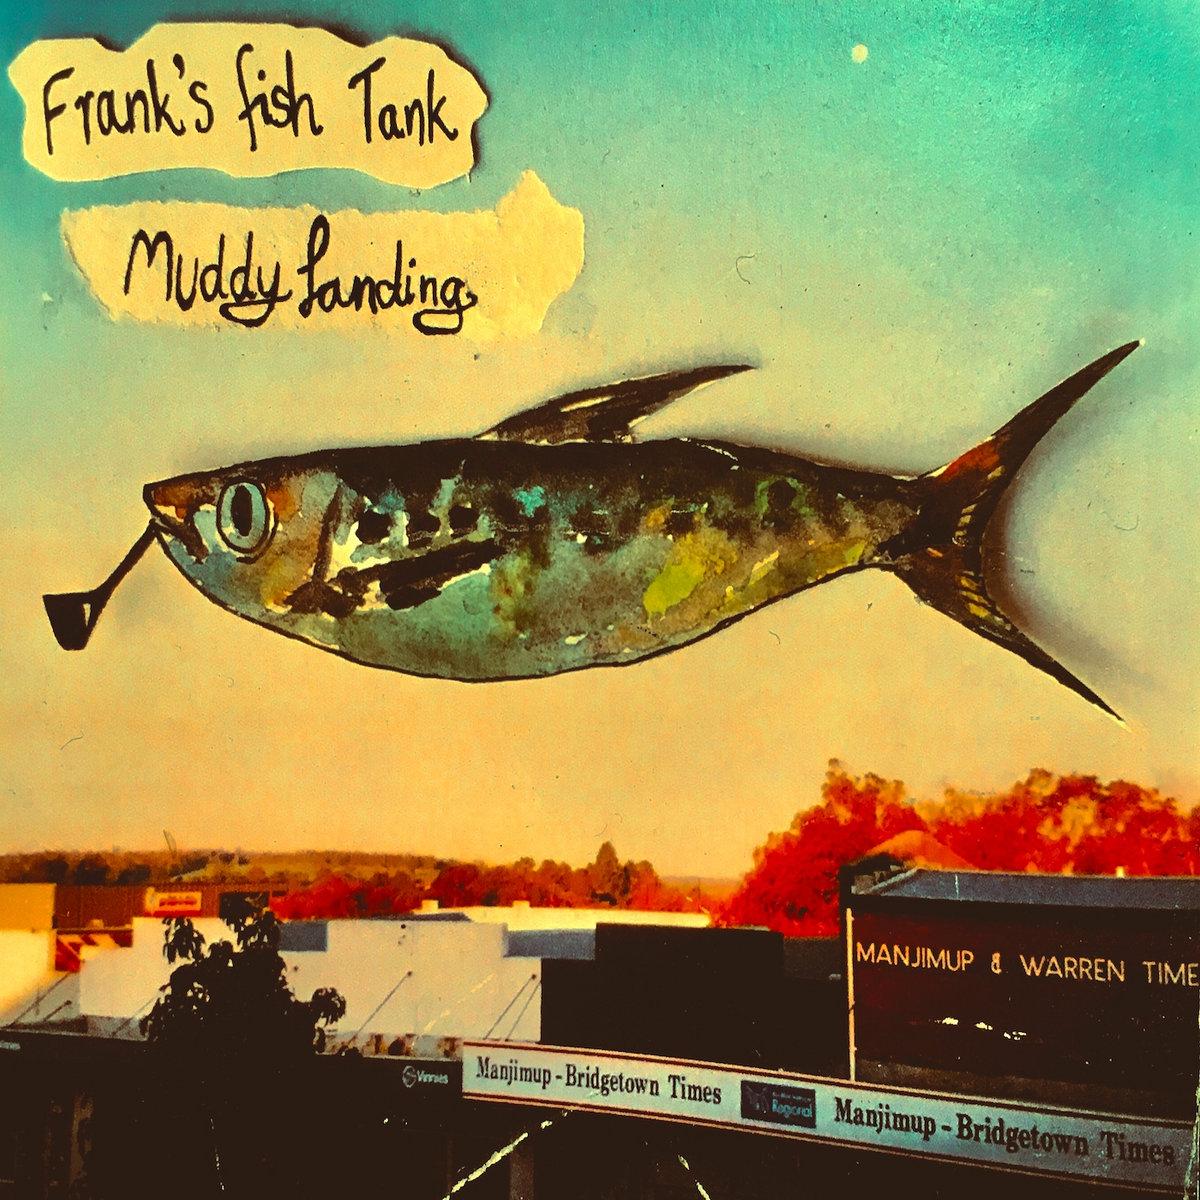 Muddy Landing | Frank's Fish Tank